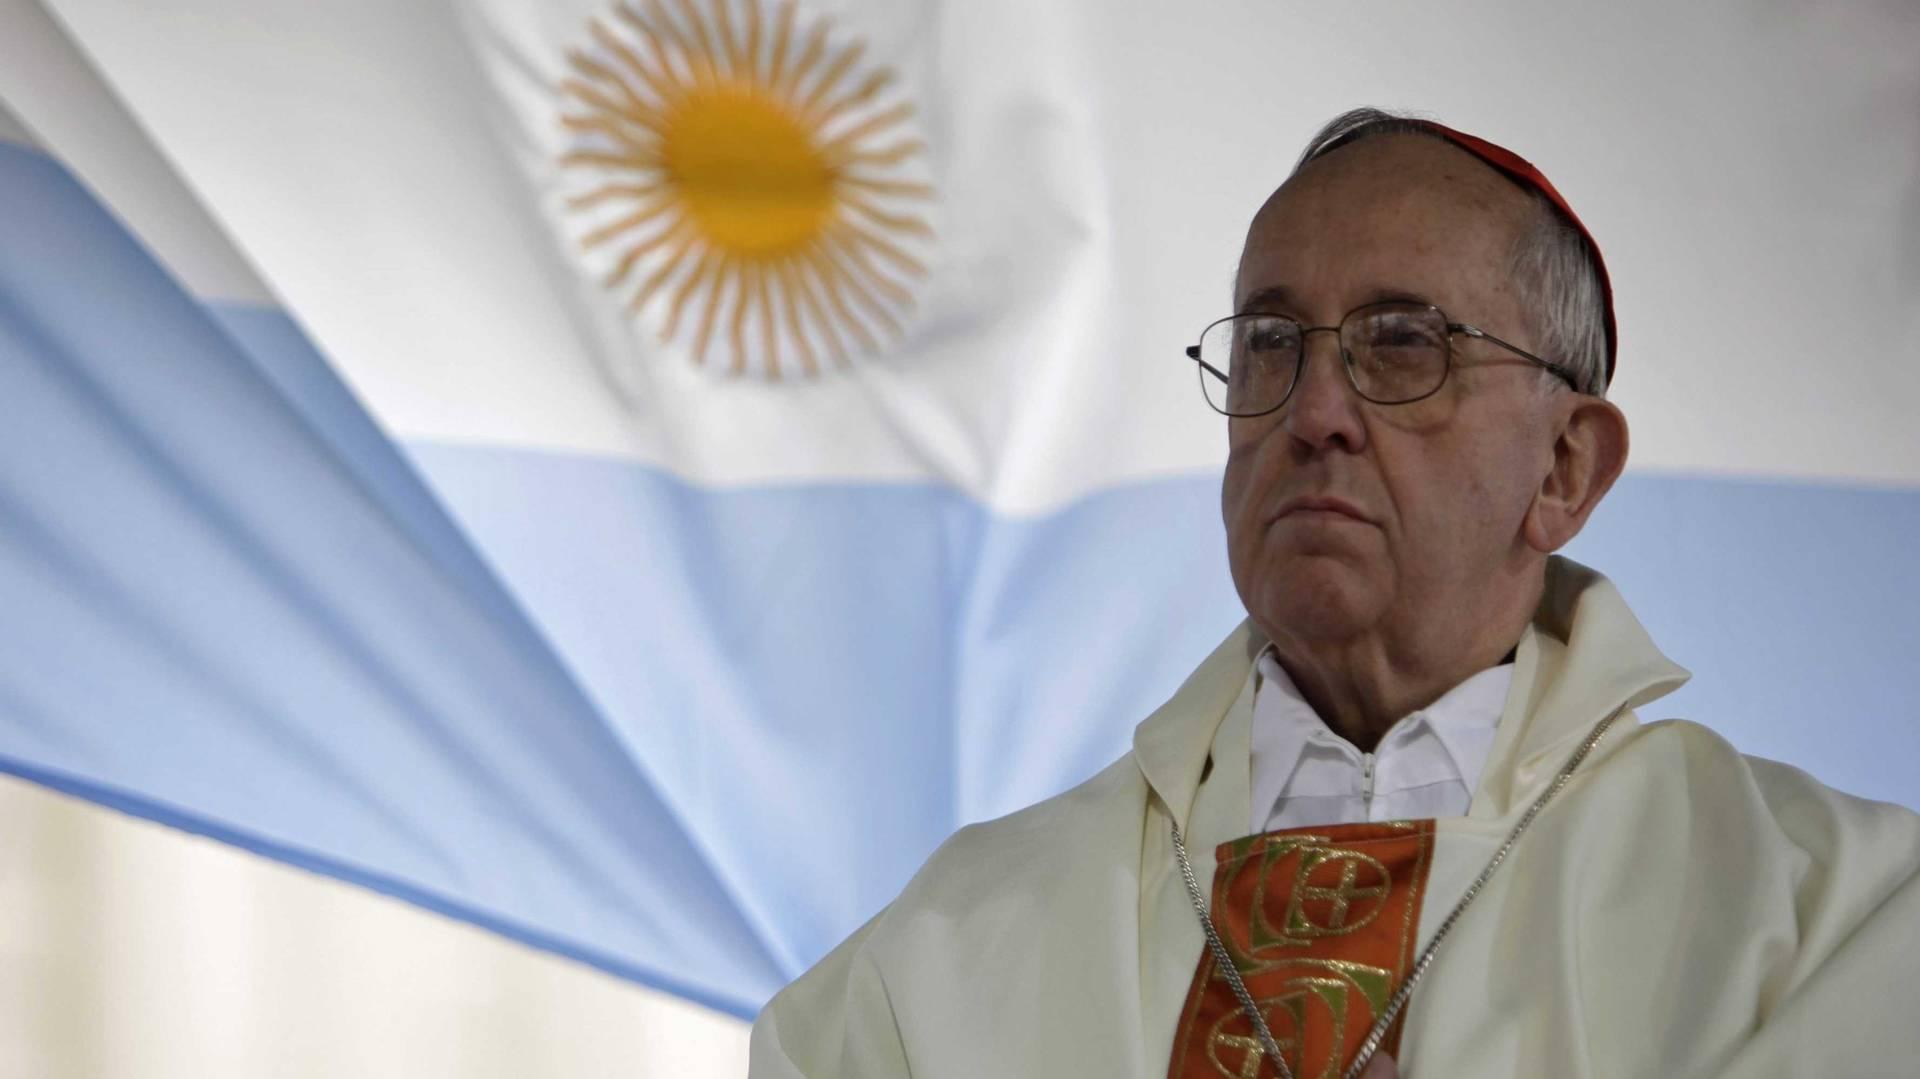 A Social Conservative Pope Francis Led Effort Against -8716